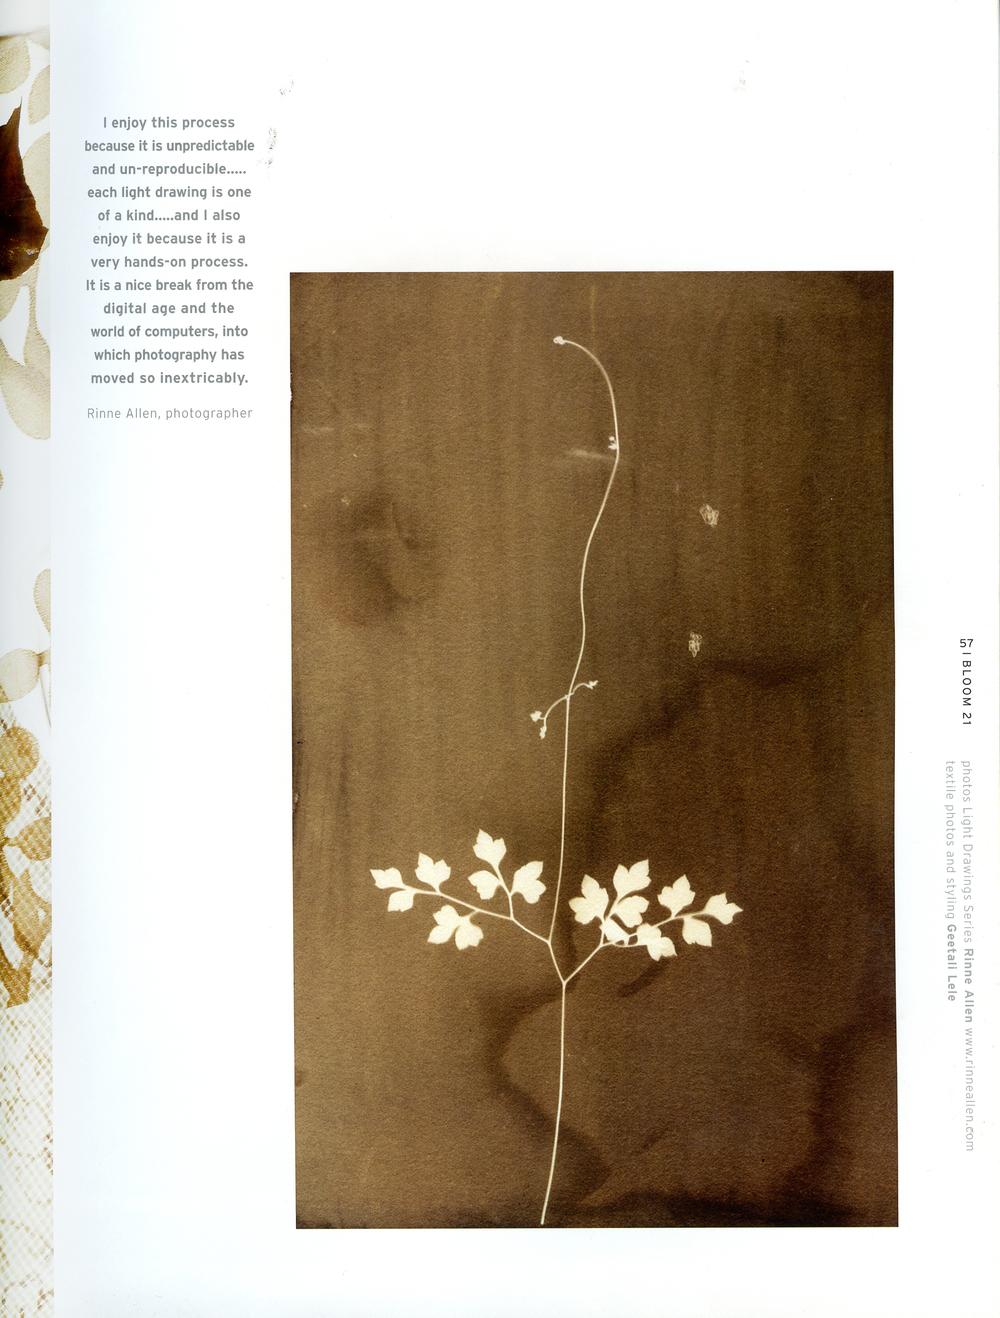 fashion bloom, issue 21 - scan 9.jpg